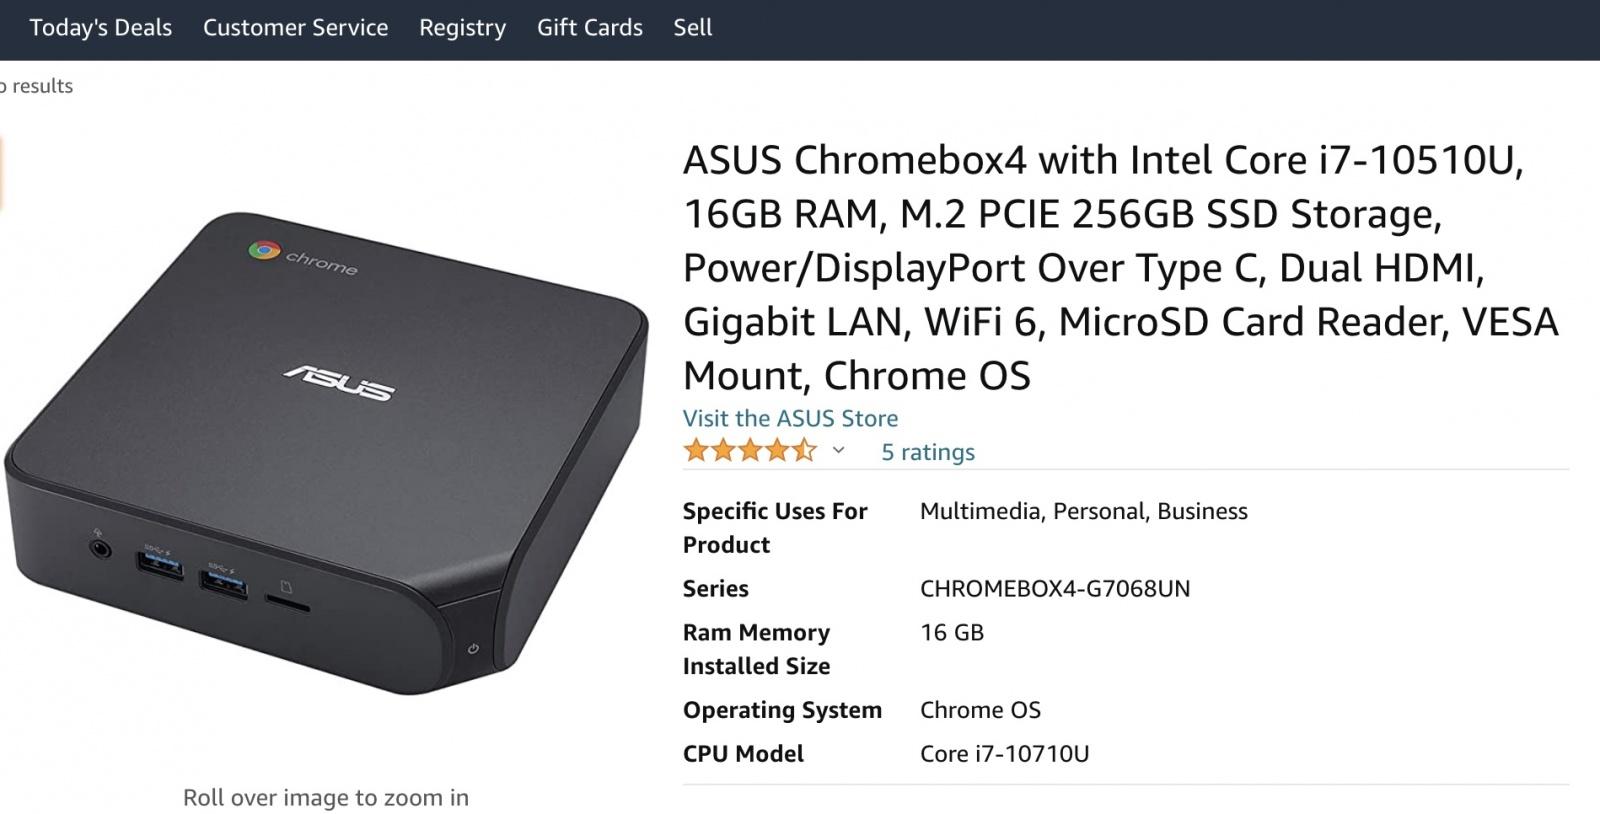 Развенчиваем мифы про Chrome OS - 6